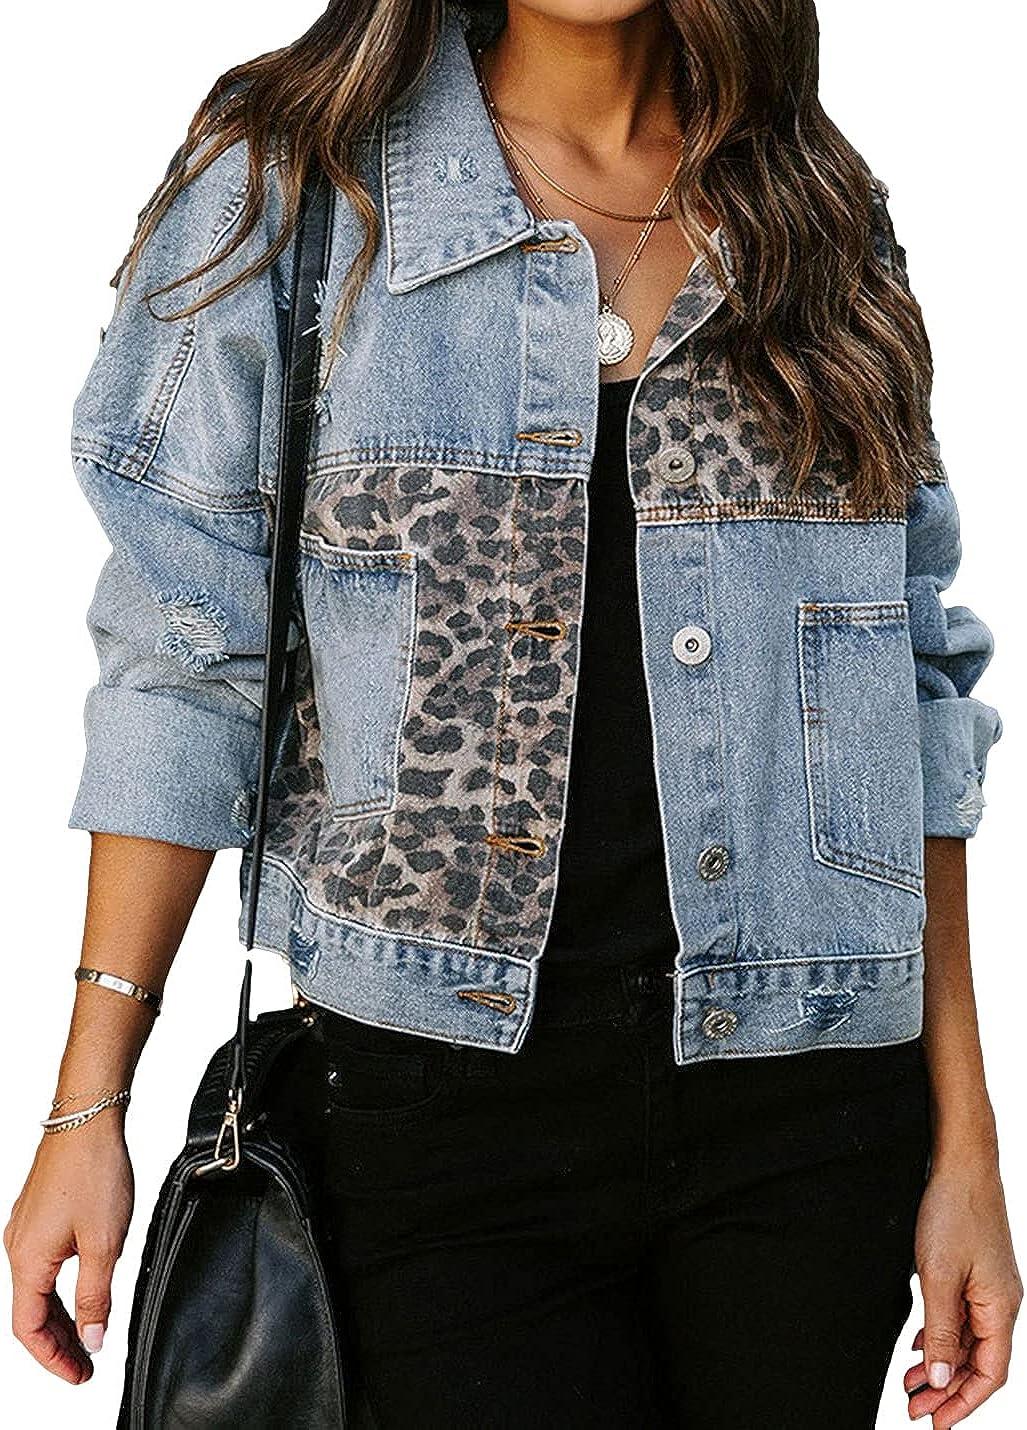 FindThy Women's Vintage Denim Jacket Leopard Patchwork Distressed Jean Trucker Jacket